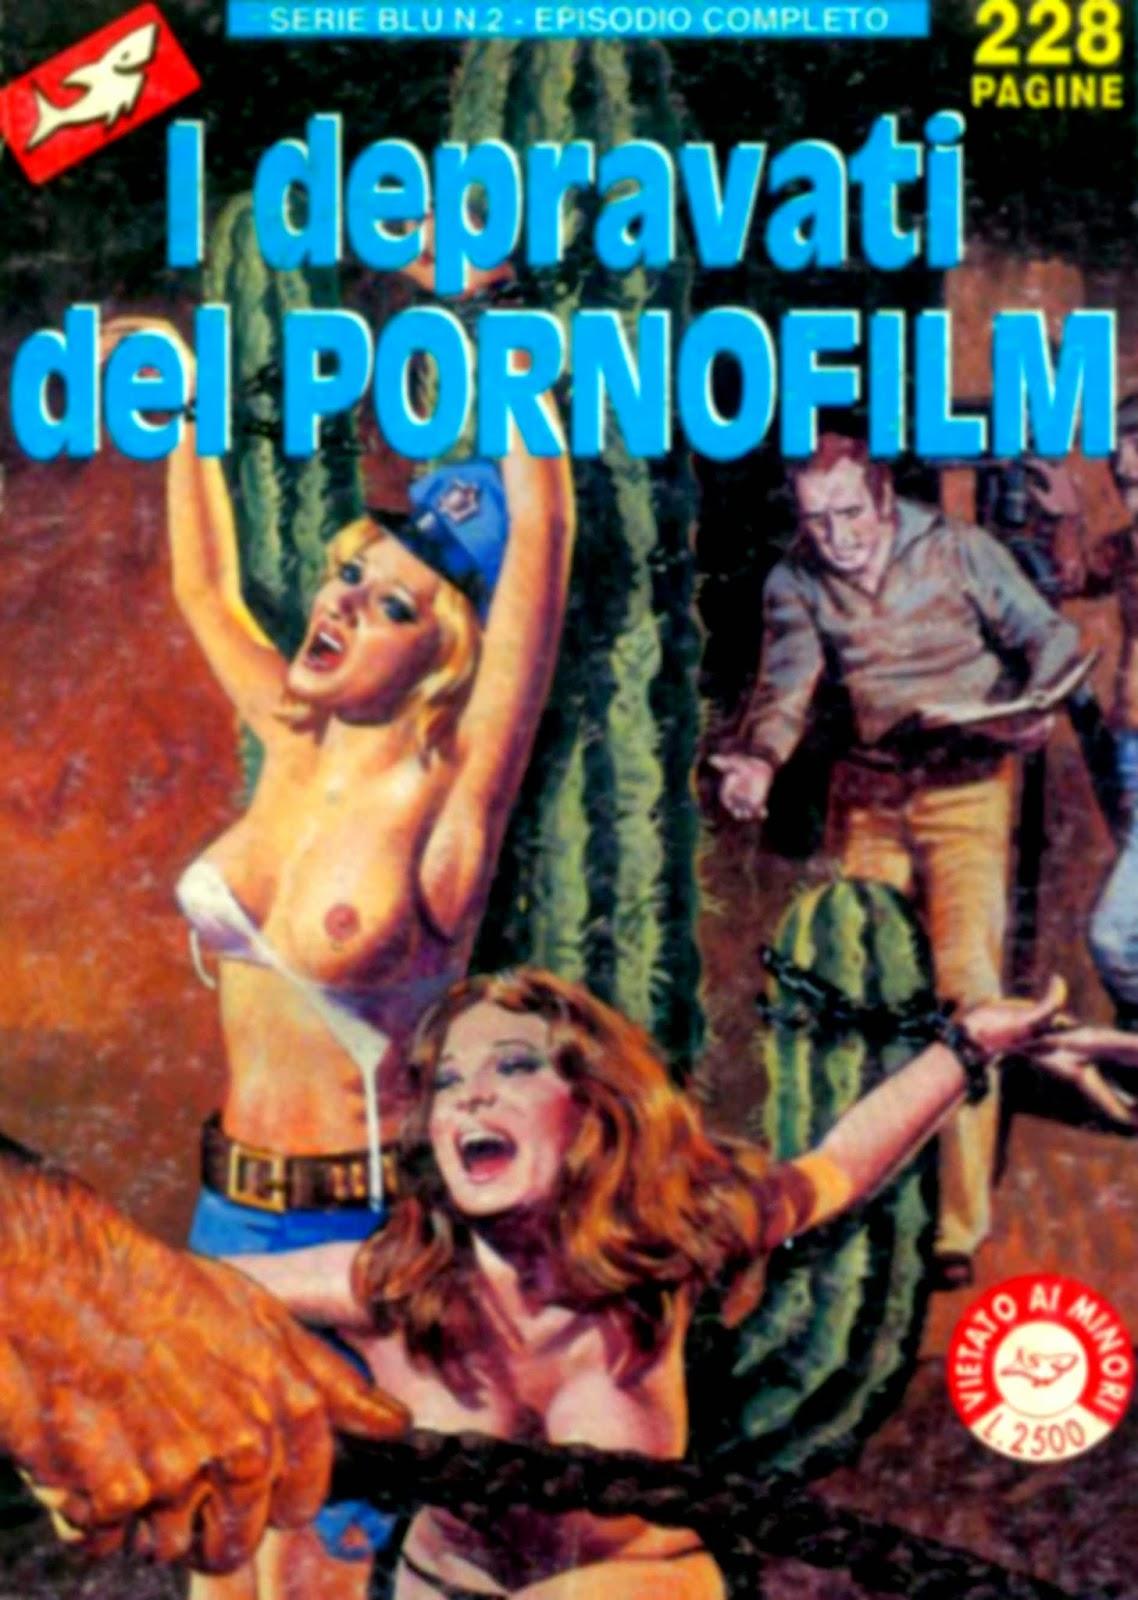 film dove fanno sesso film erotici horror